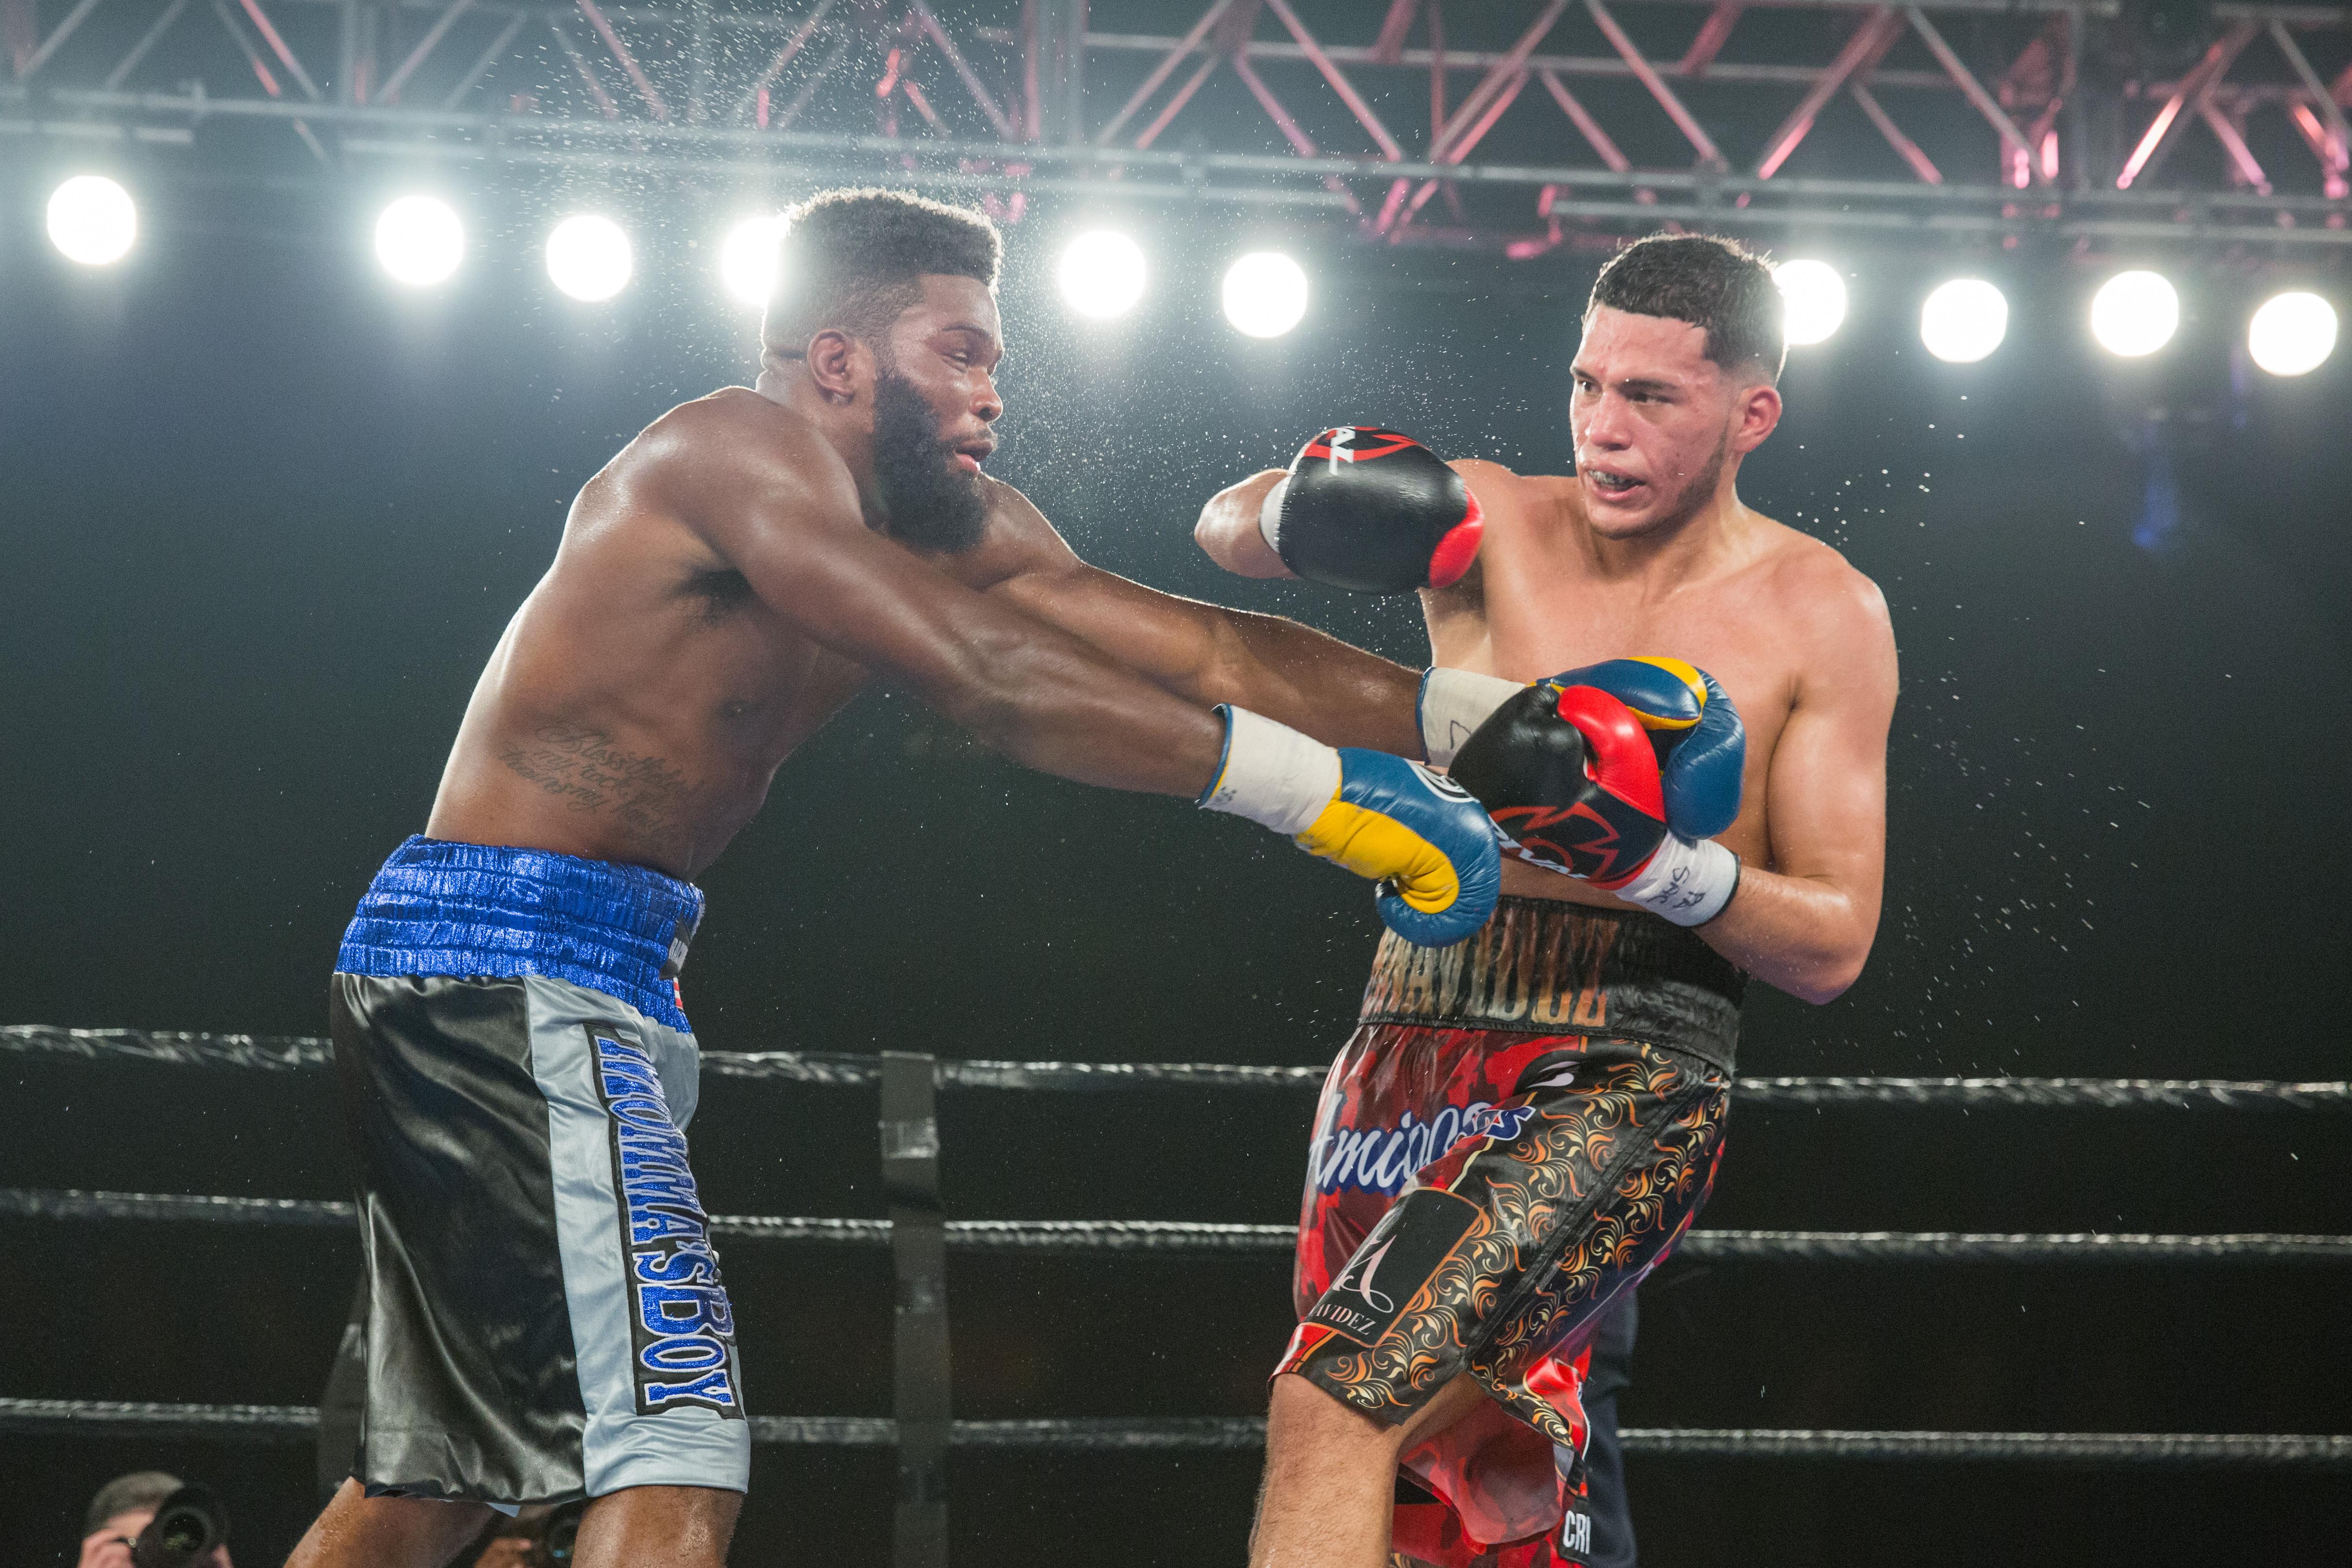 Undefeated Rising Star David Benavidez Knocks Out Denis Douglin